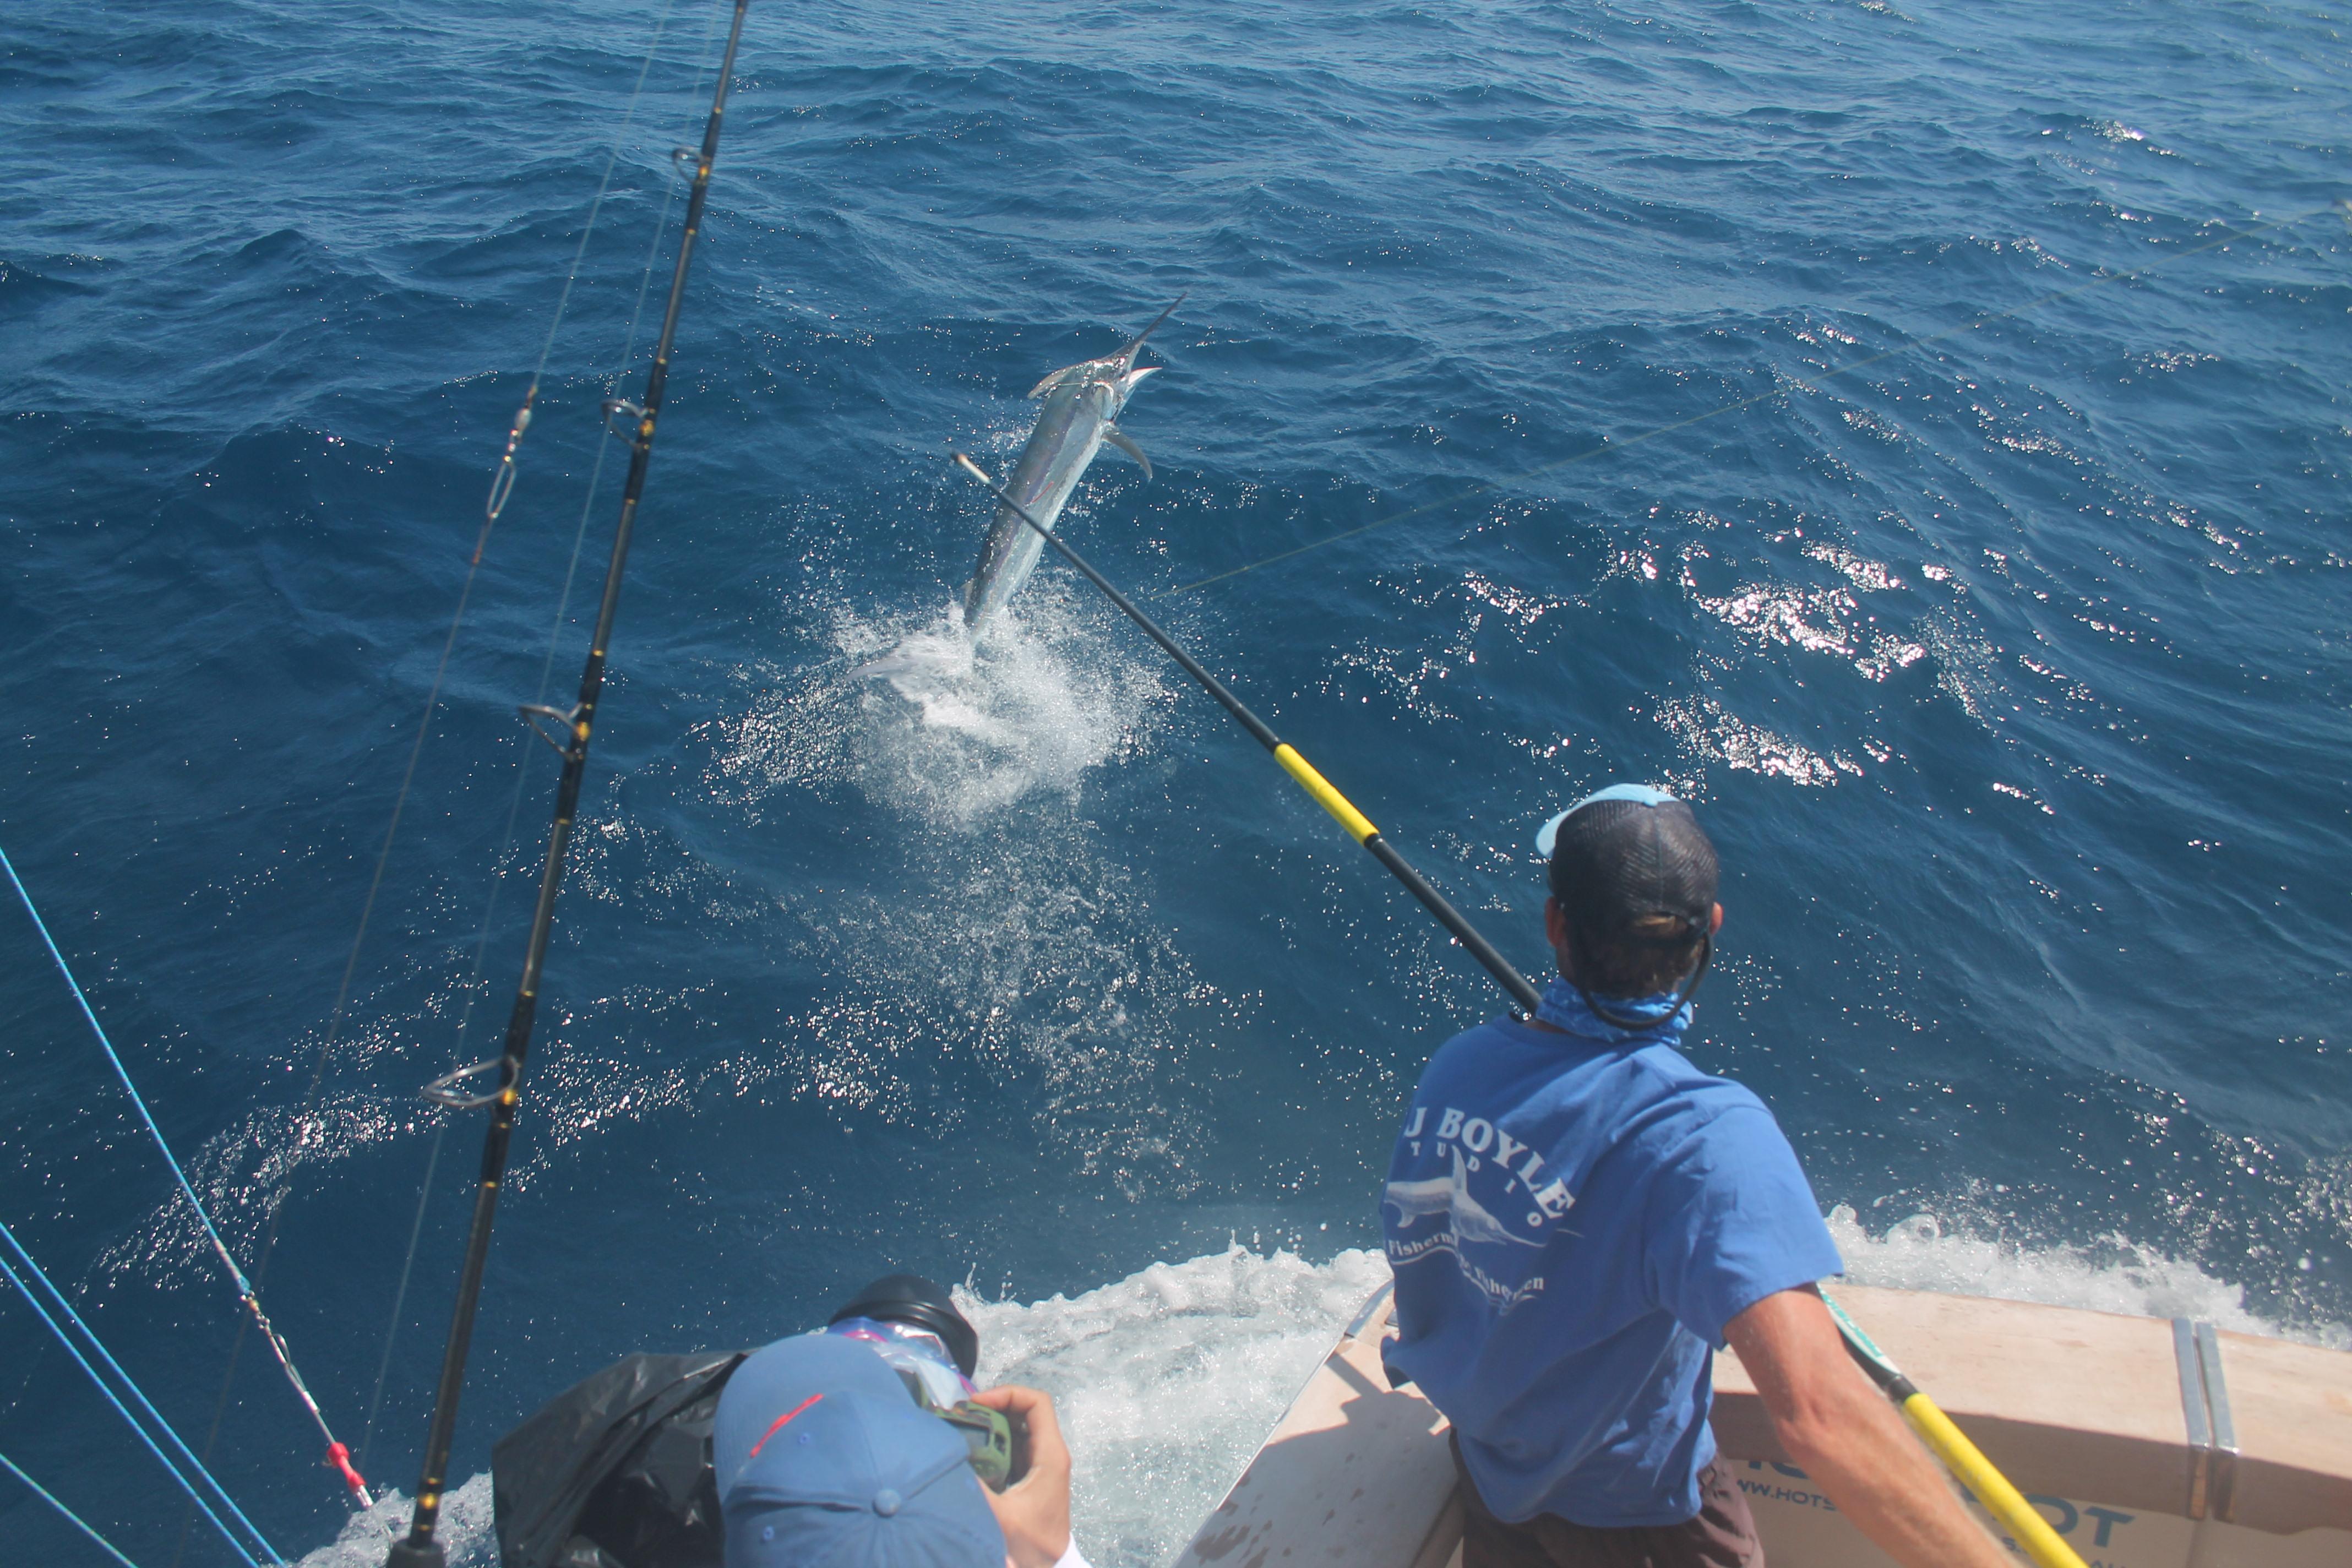 Hotshot marlin fishing charters february fishing report for Marlin fishing charters